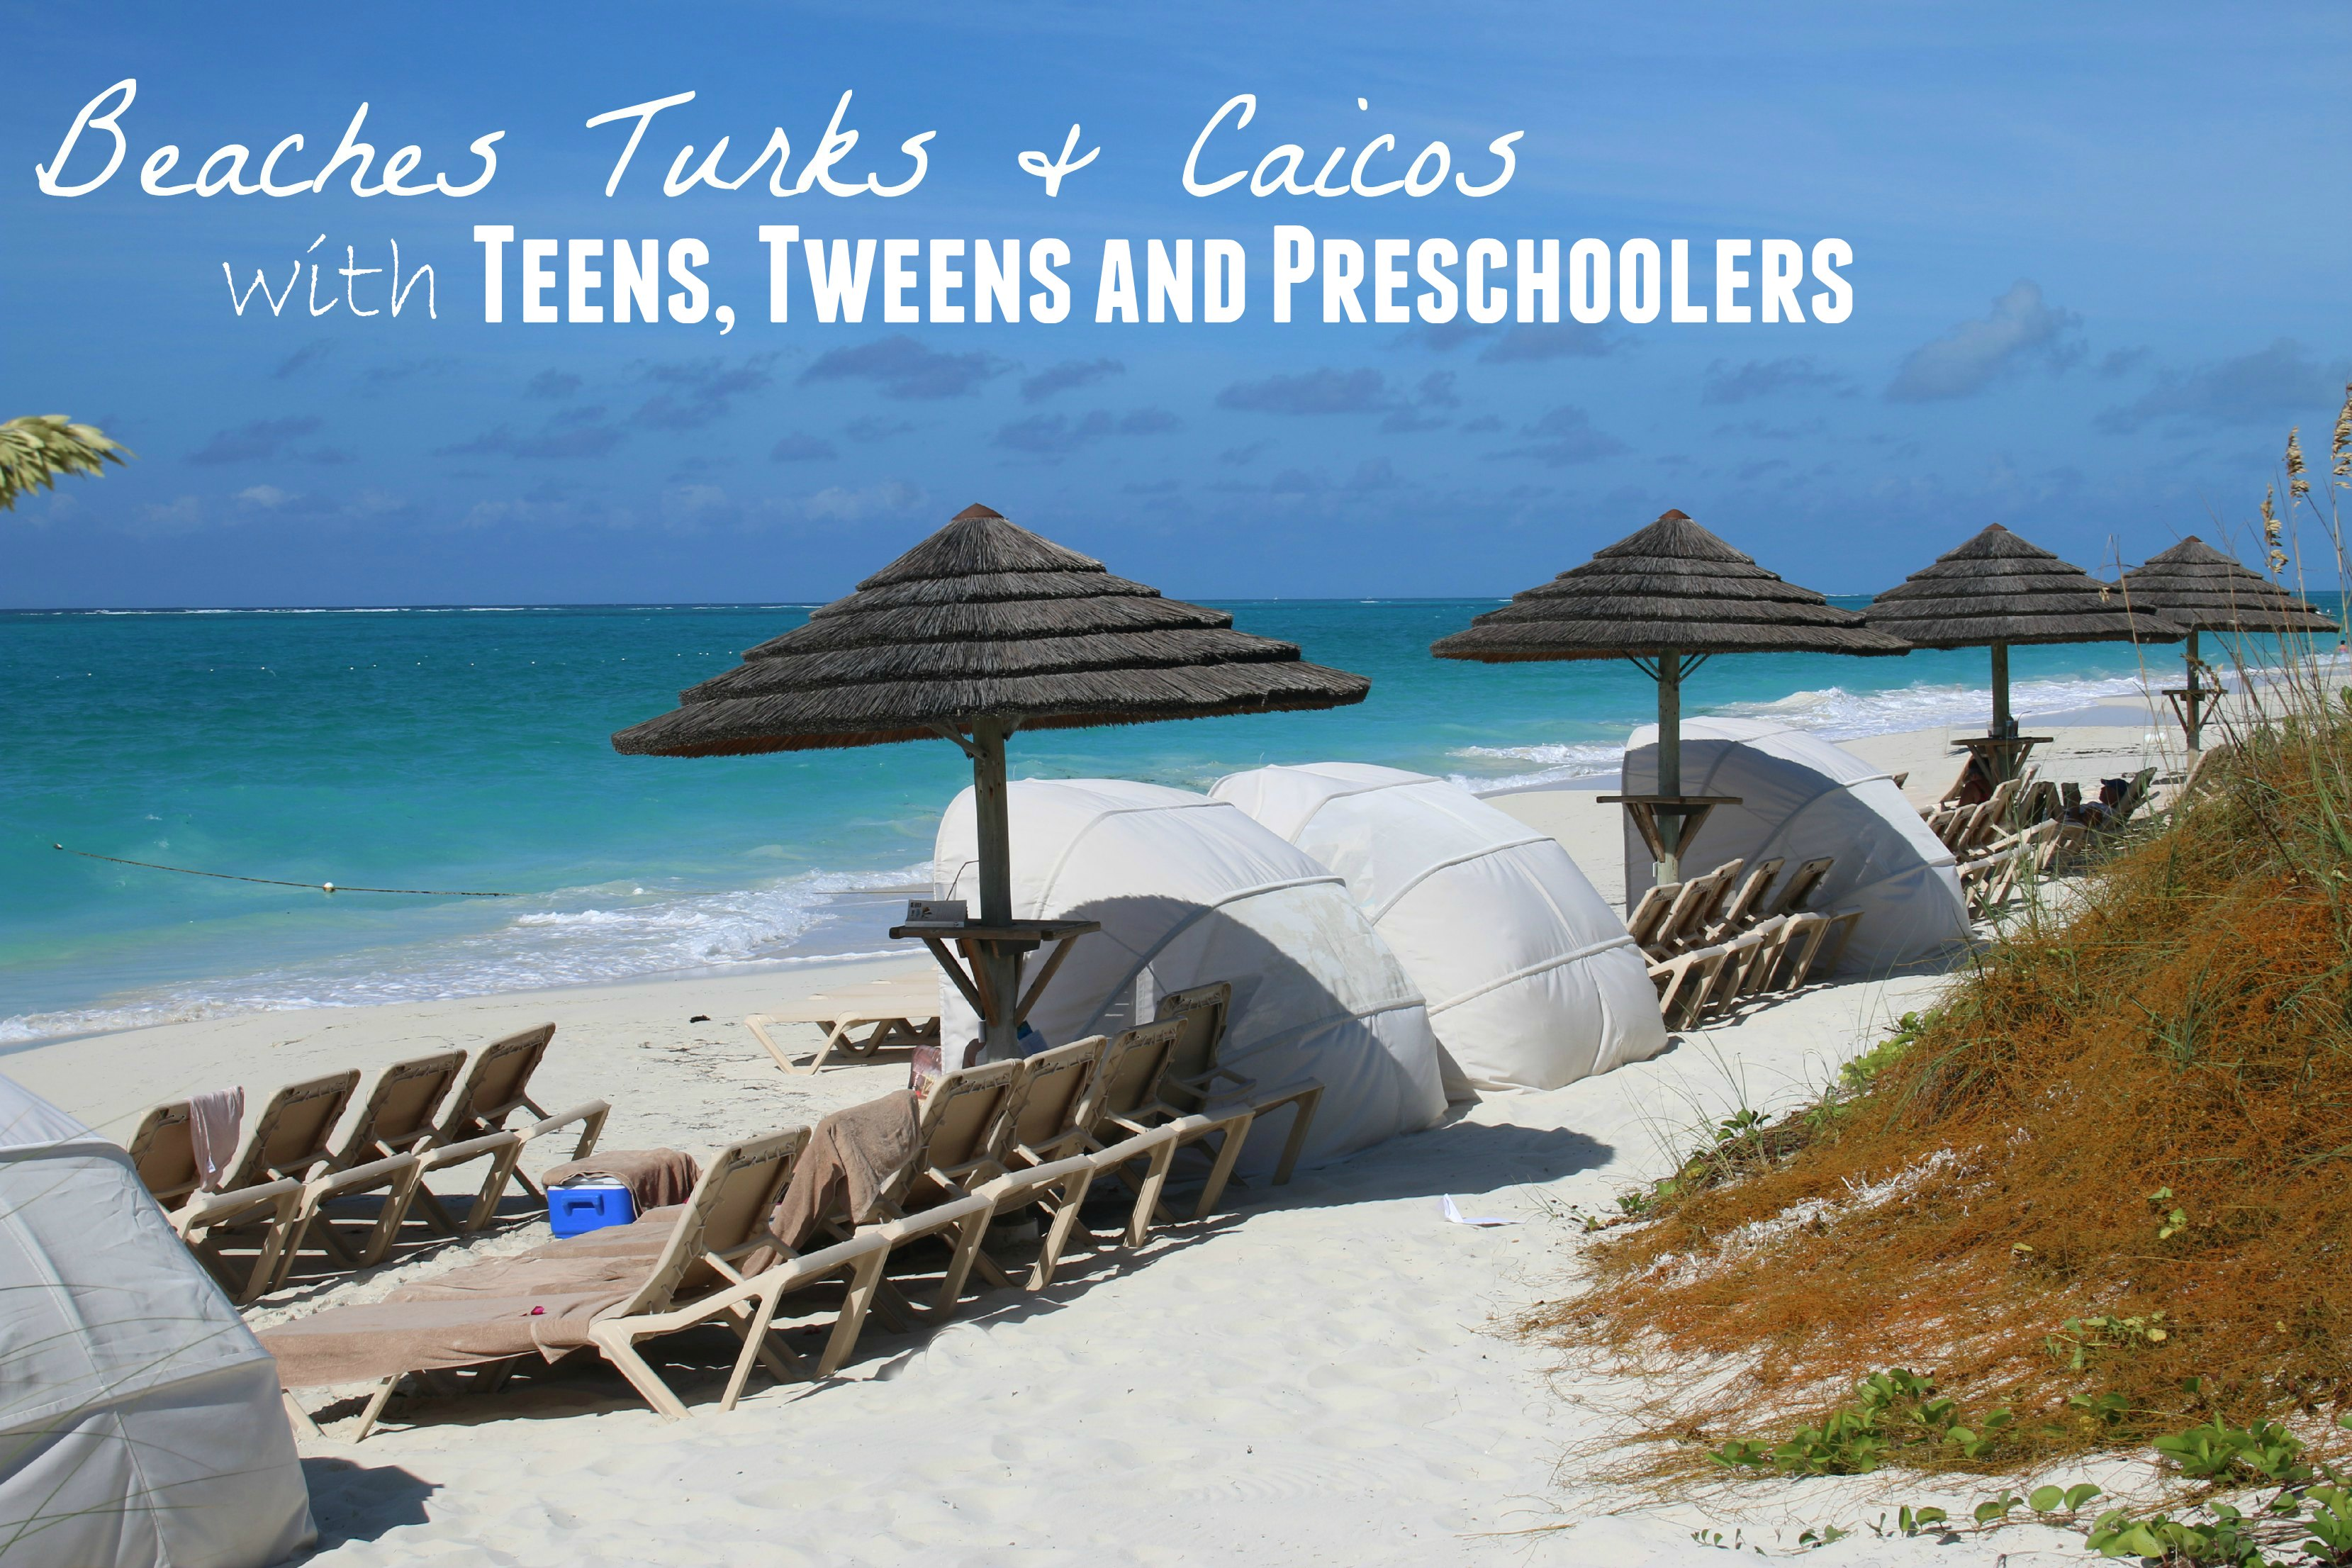 beaches turks teens tweens preschoolers